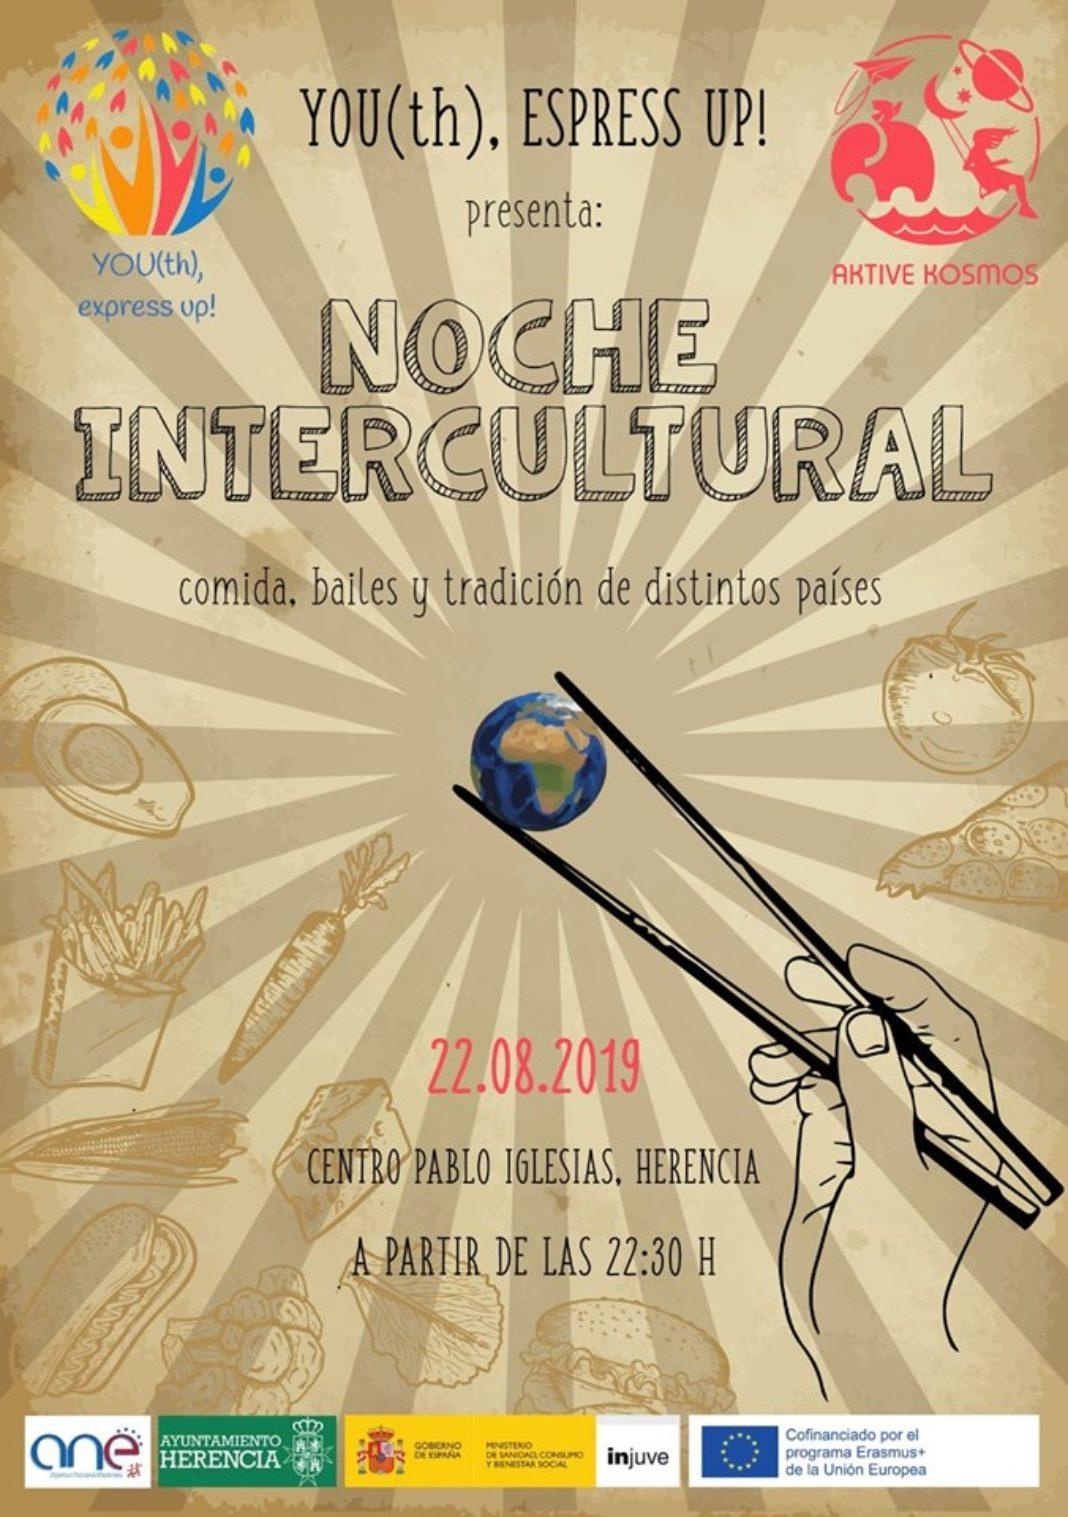 Aktive Kosmos noche intercultural 1068x1517 - Noche Intercultural de la mano de Aktive Kosmos y el proyecto Erasmus+ Youth Express Up!